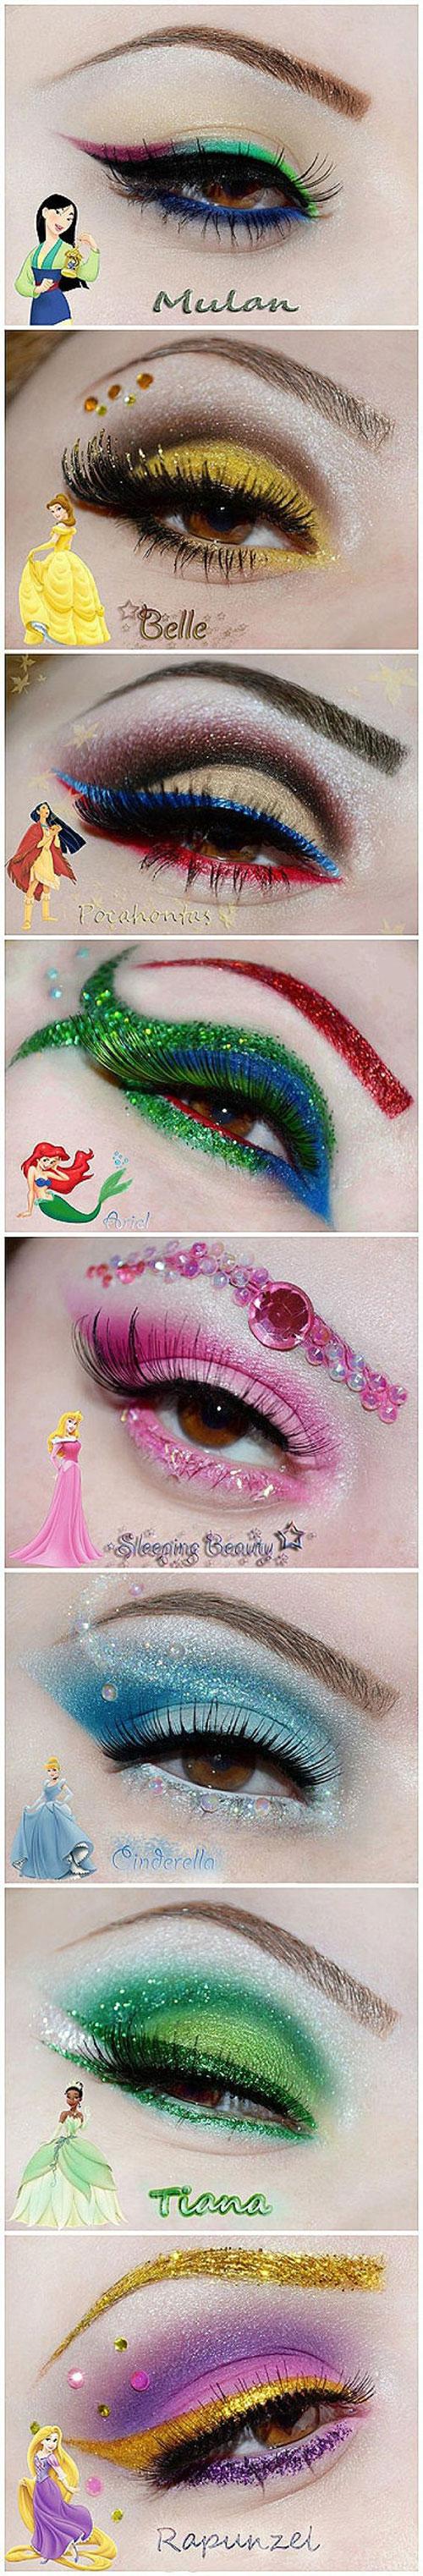 20-Halloween-Eye-Makeup-Ideas-Looks-For-Girls-Women-2017-22